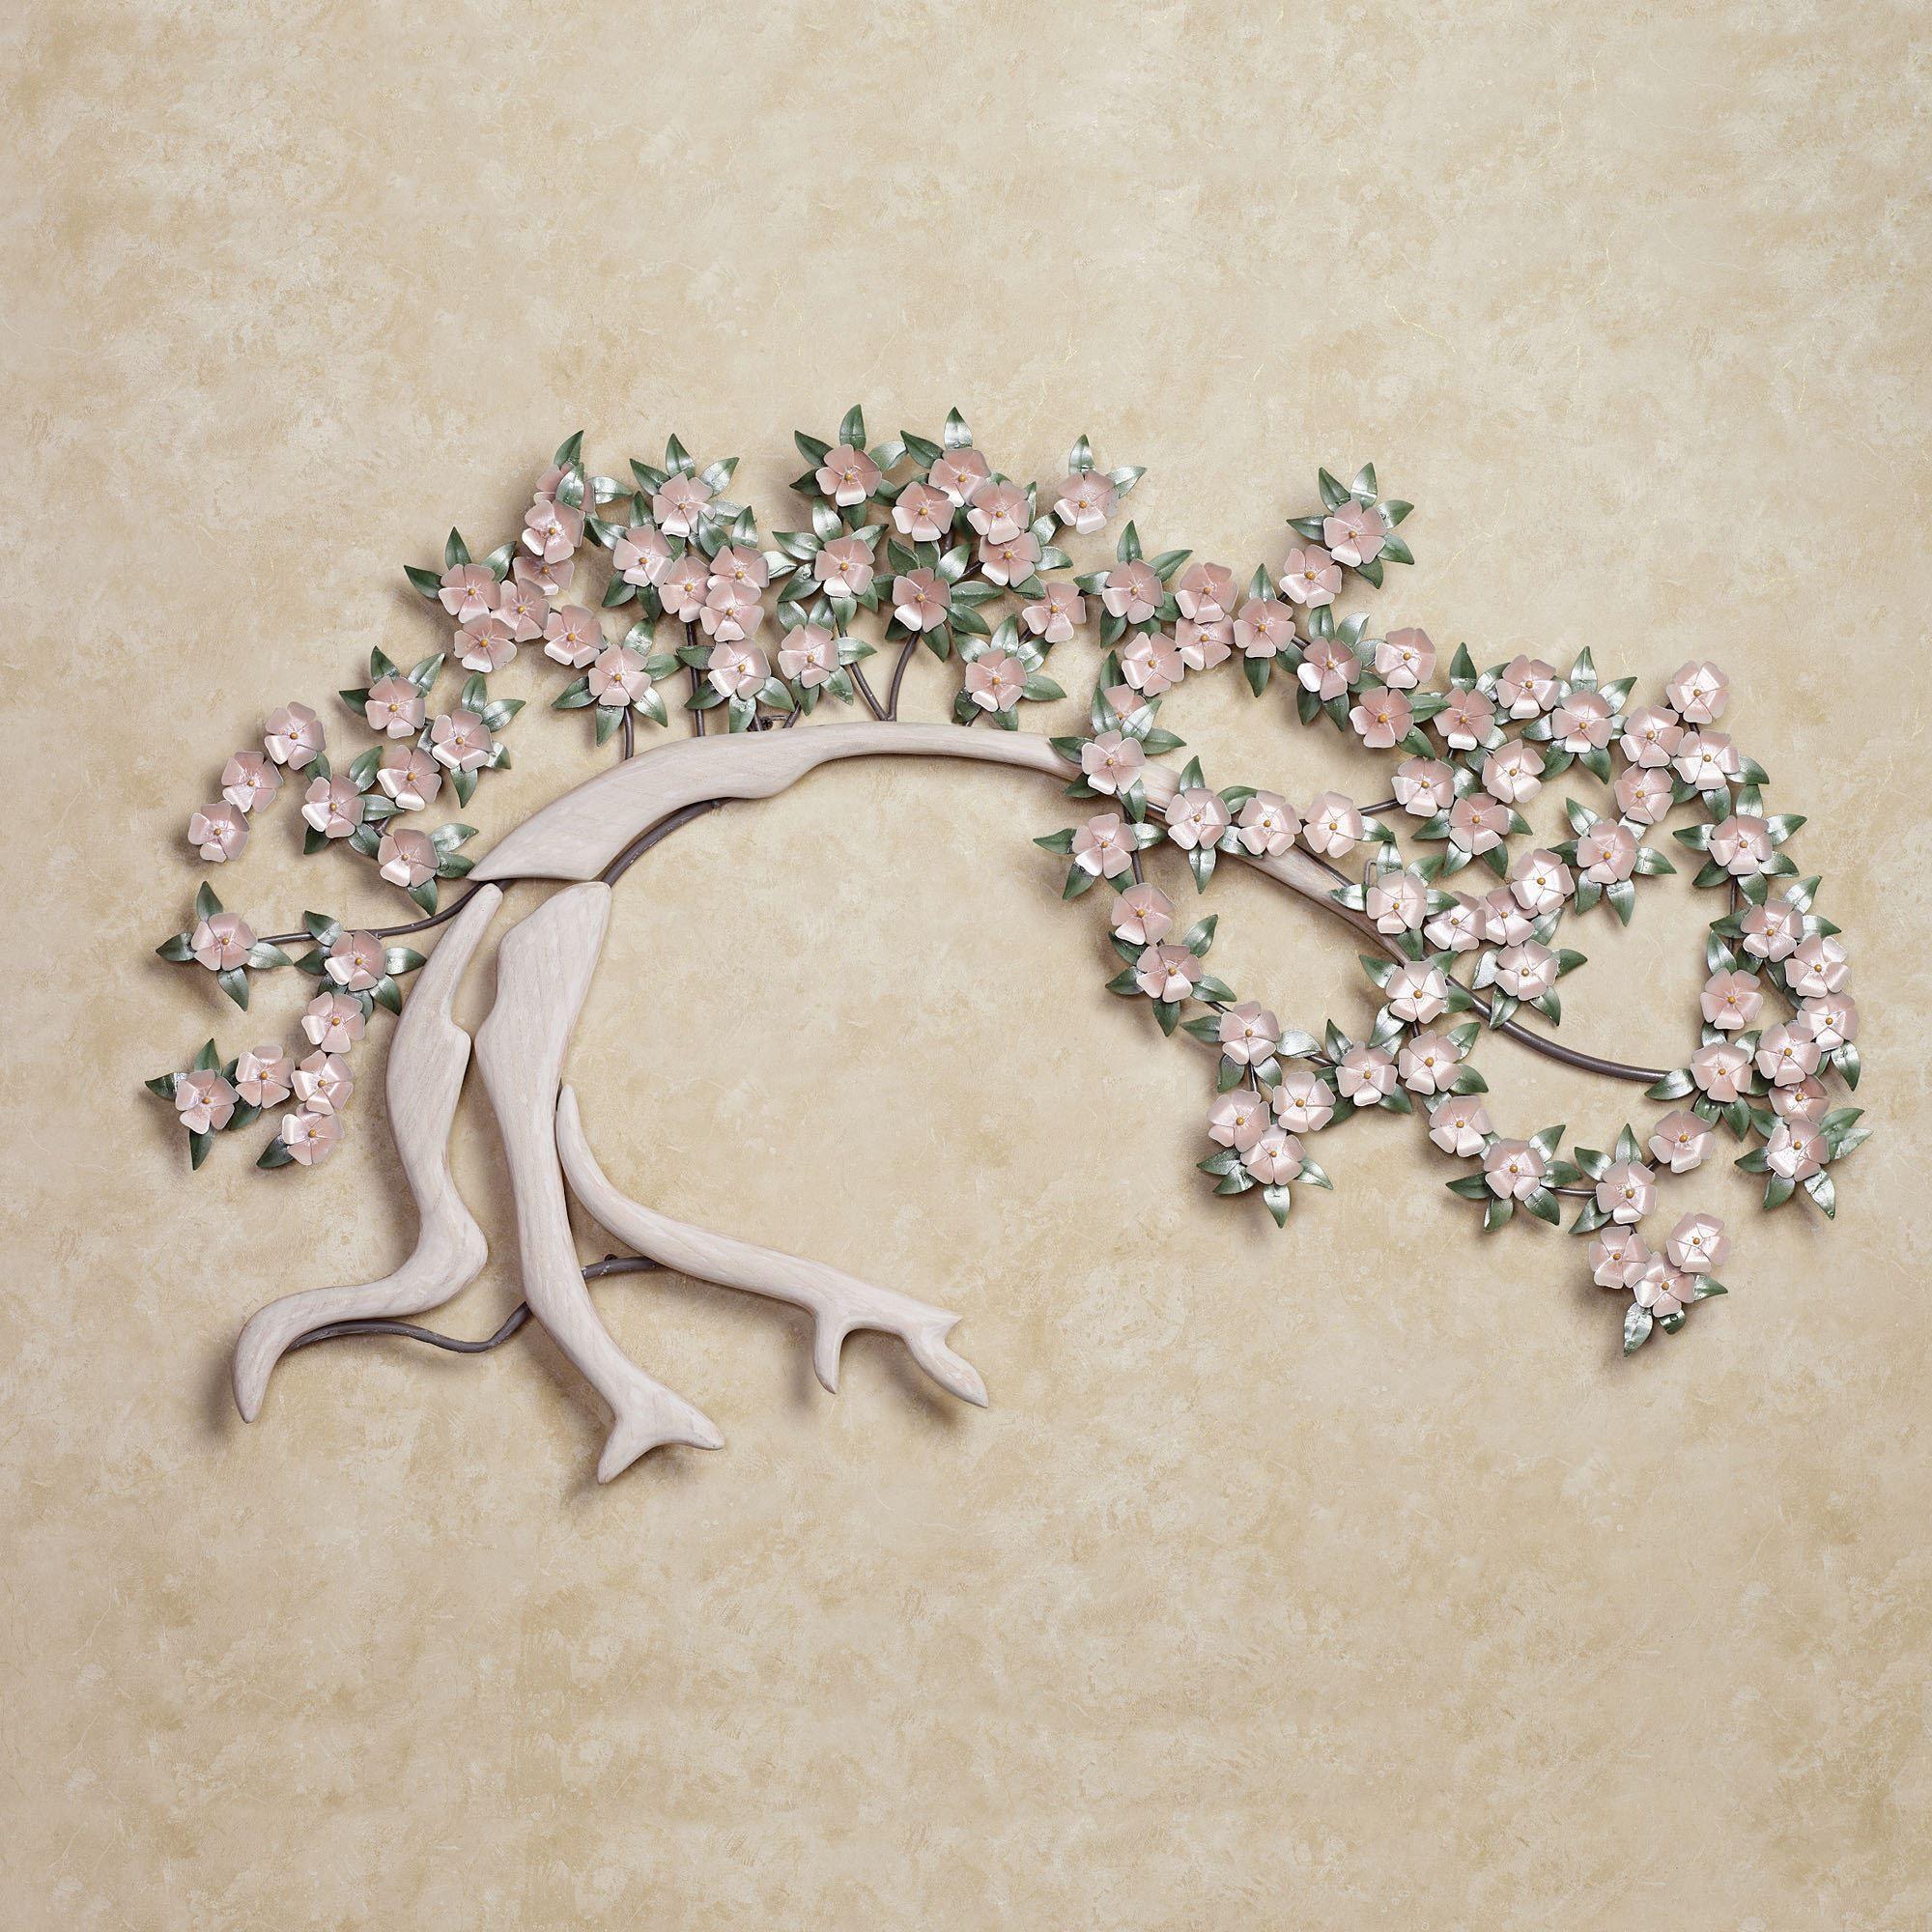 Weeping cherry metal wall sculpture studios sculpture and art